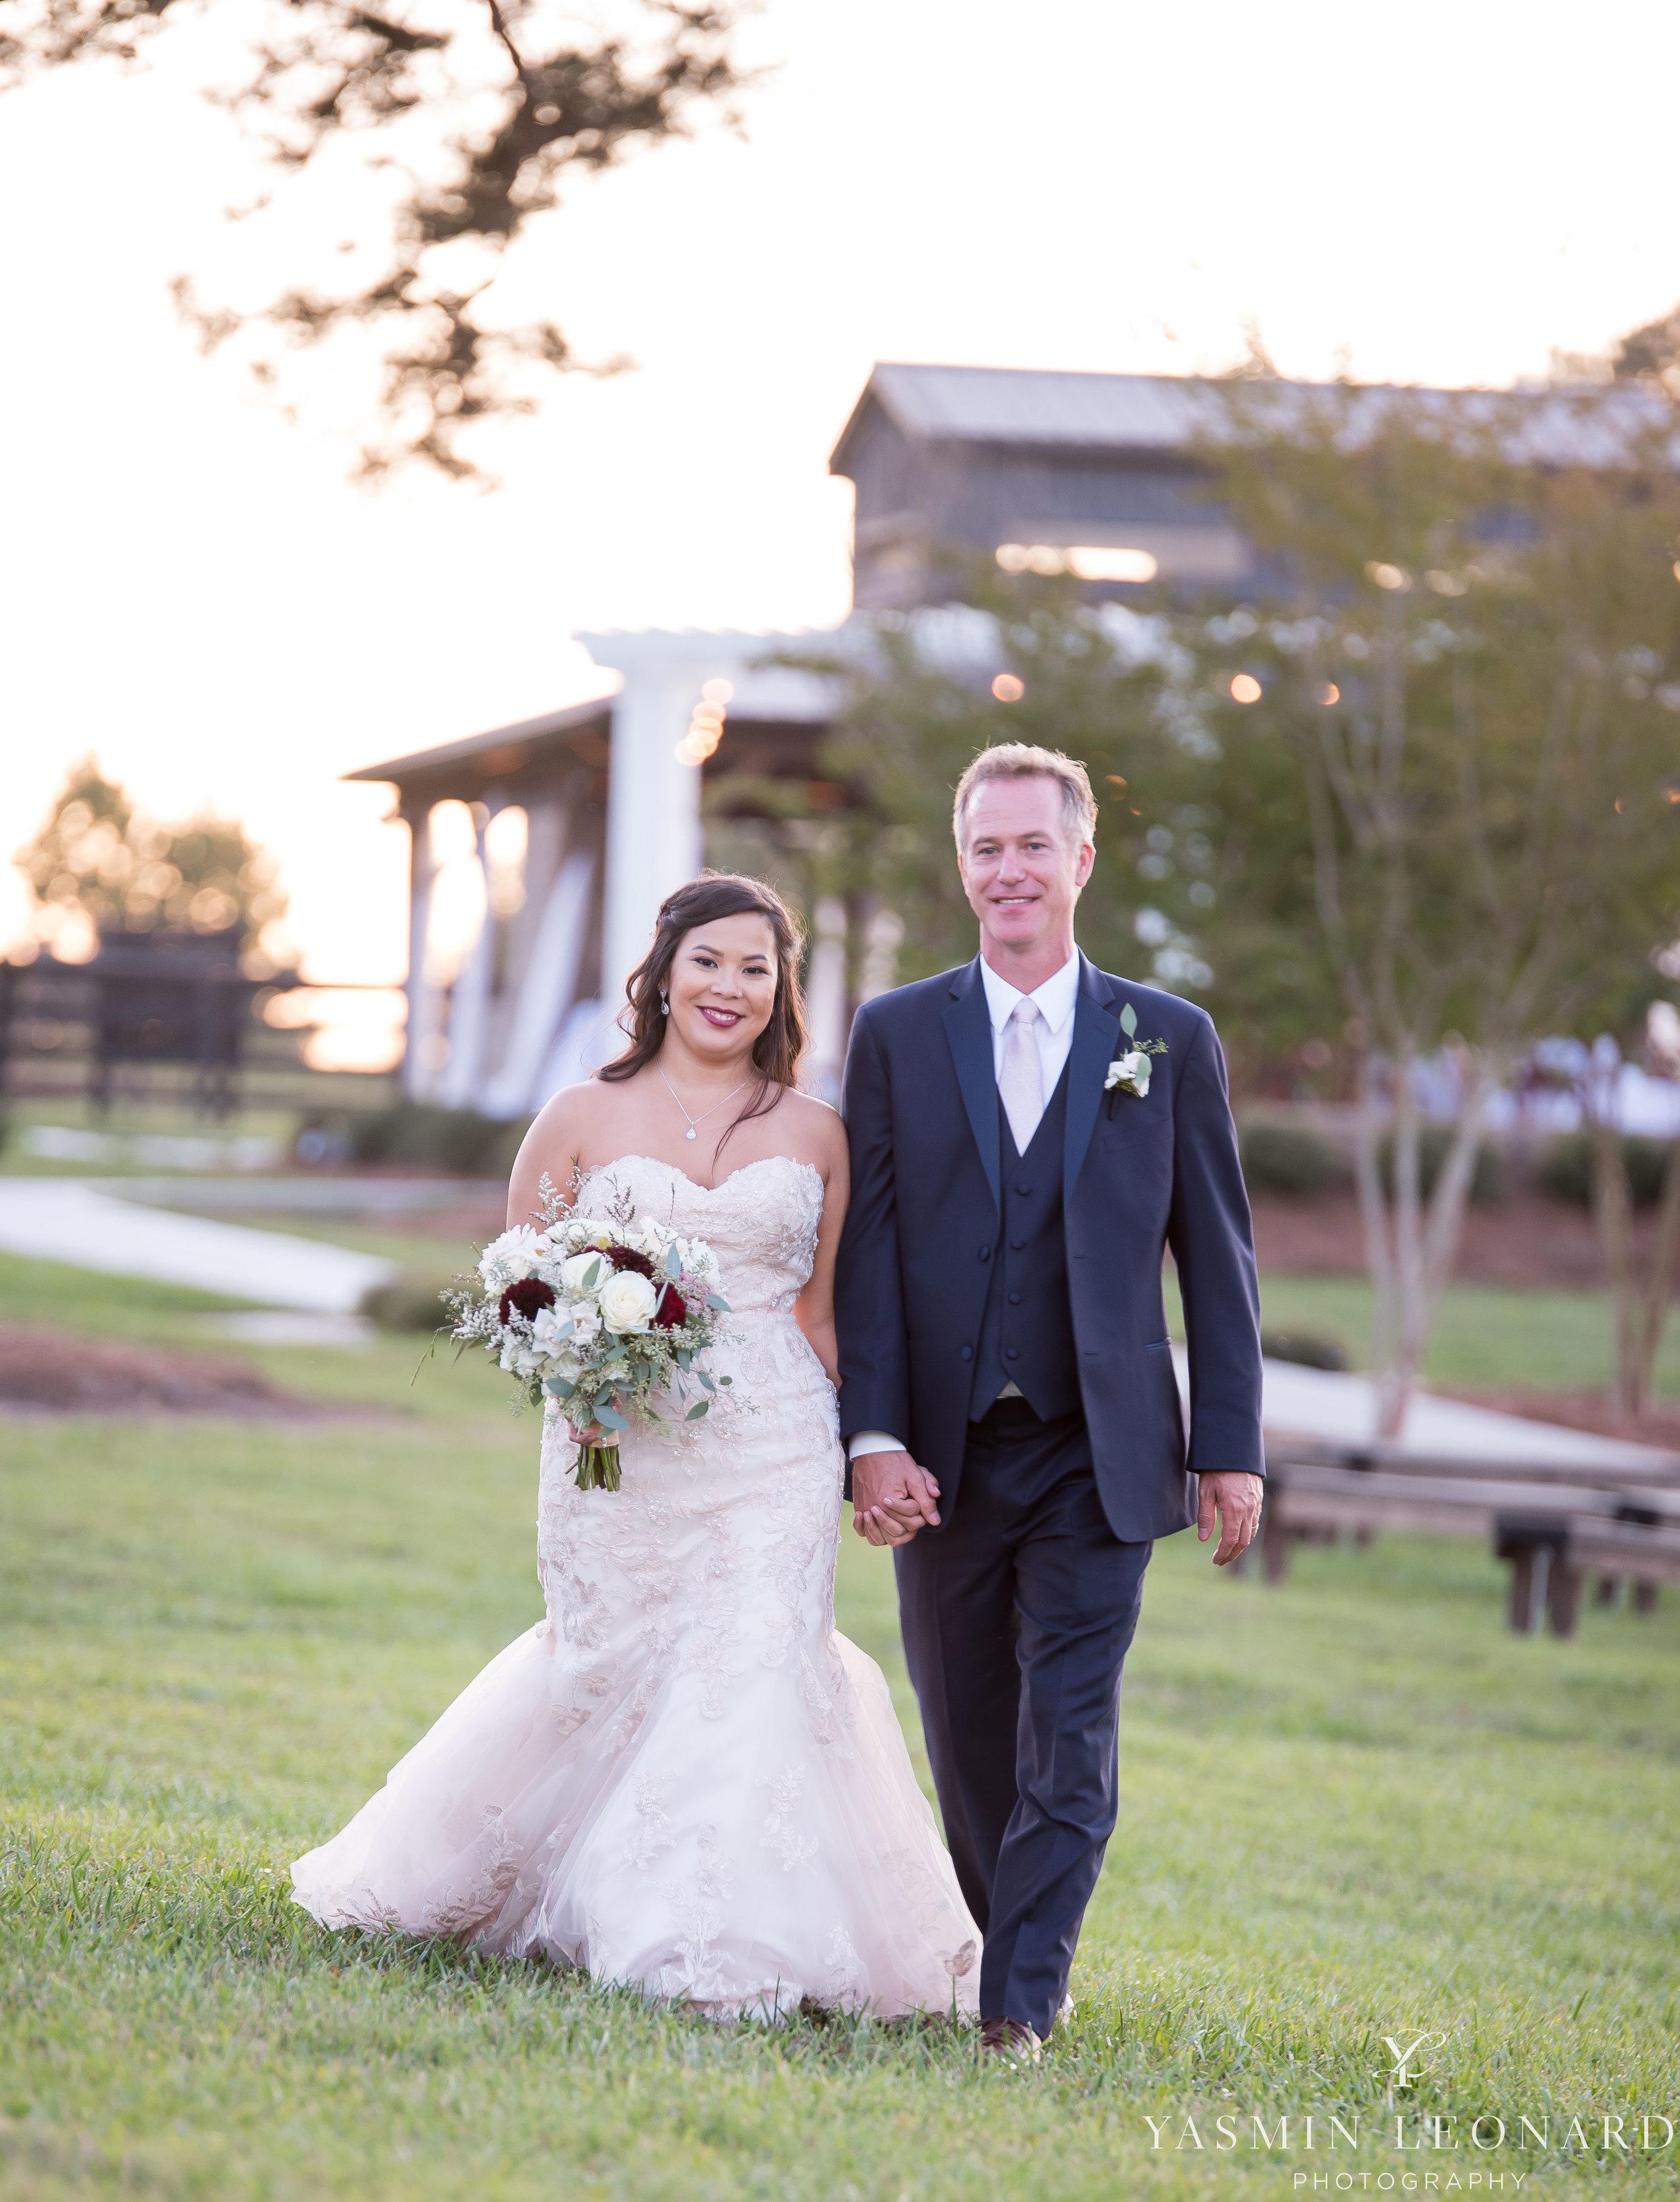 Mason Ridge   Liberty, NC   Aylissa and John   Yasmin Leonard Photography-71.jpg